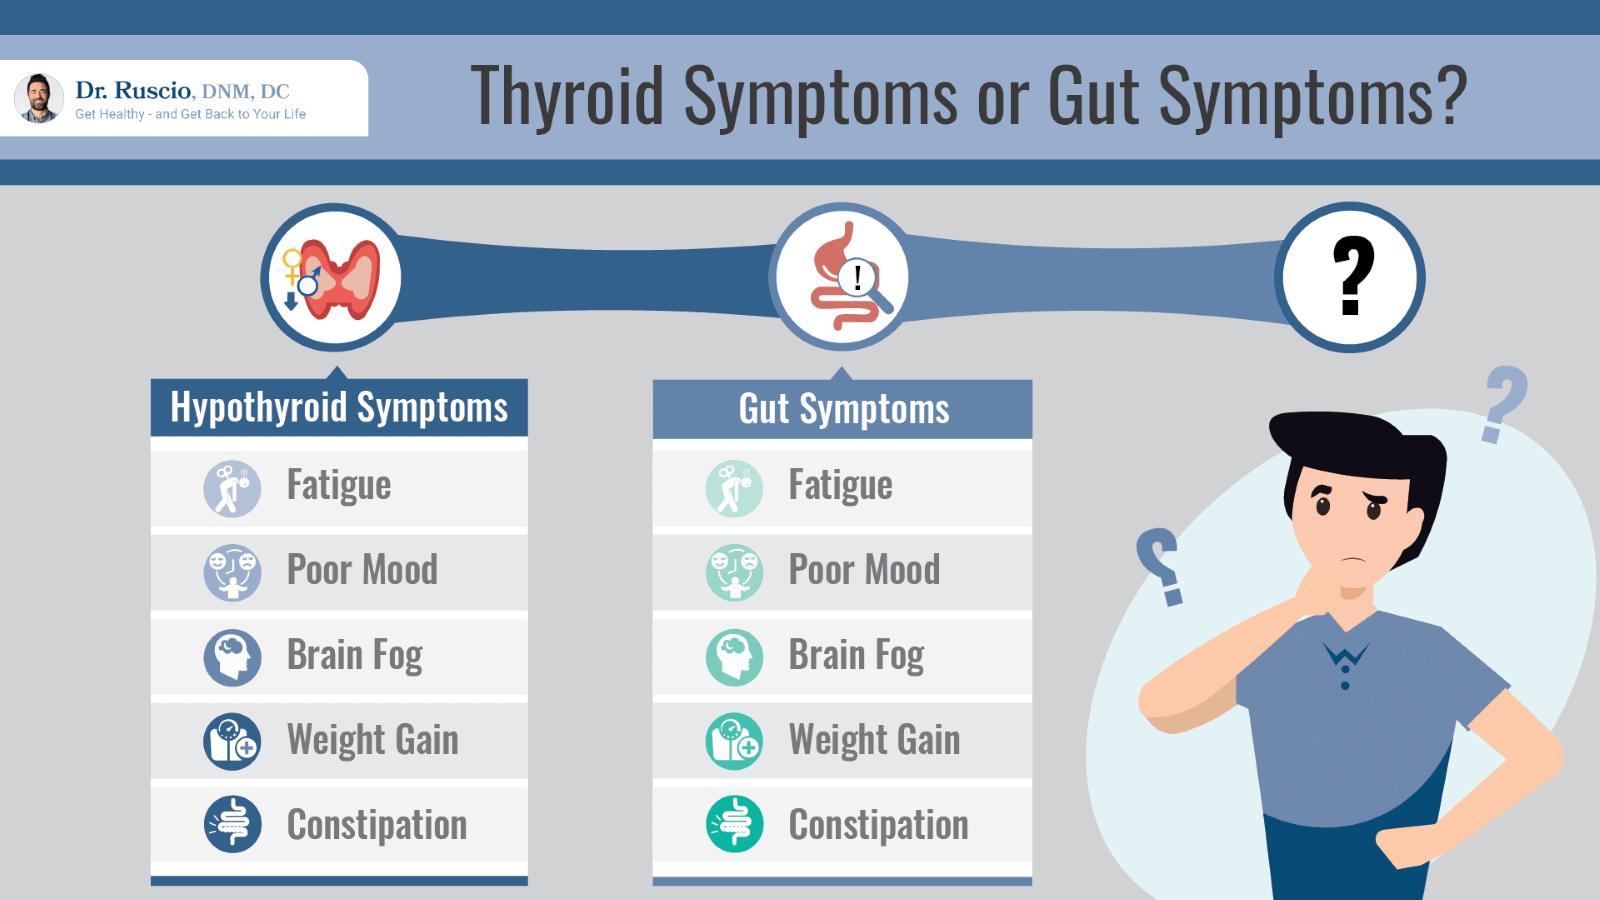 Thyroid symptoms vs gut symptoms chart by Dr. Ruscio